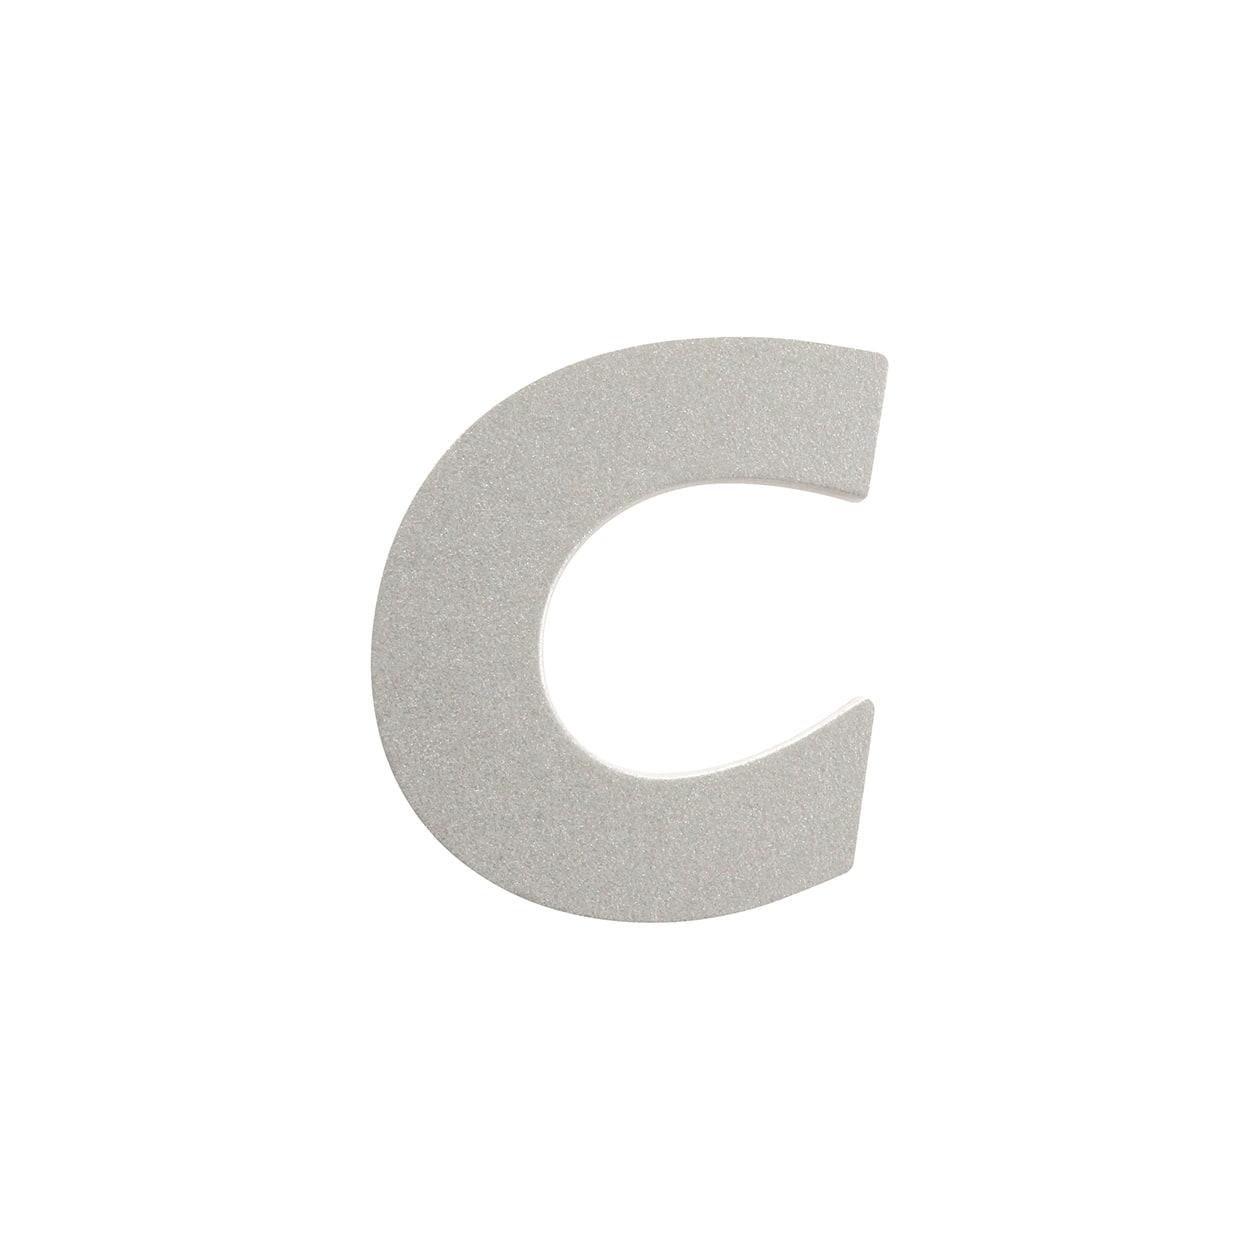 No.395ボード A7カードDC 文字C シルバー